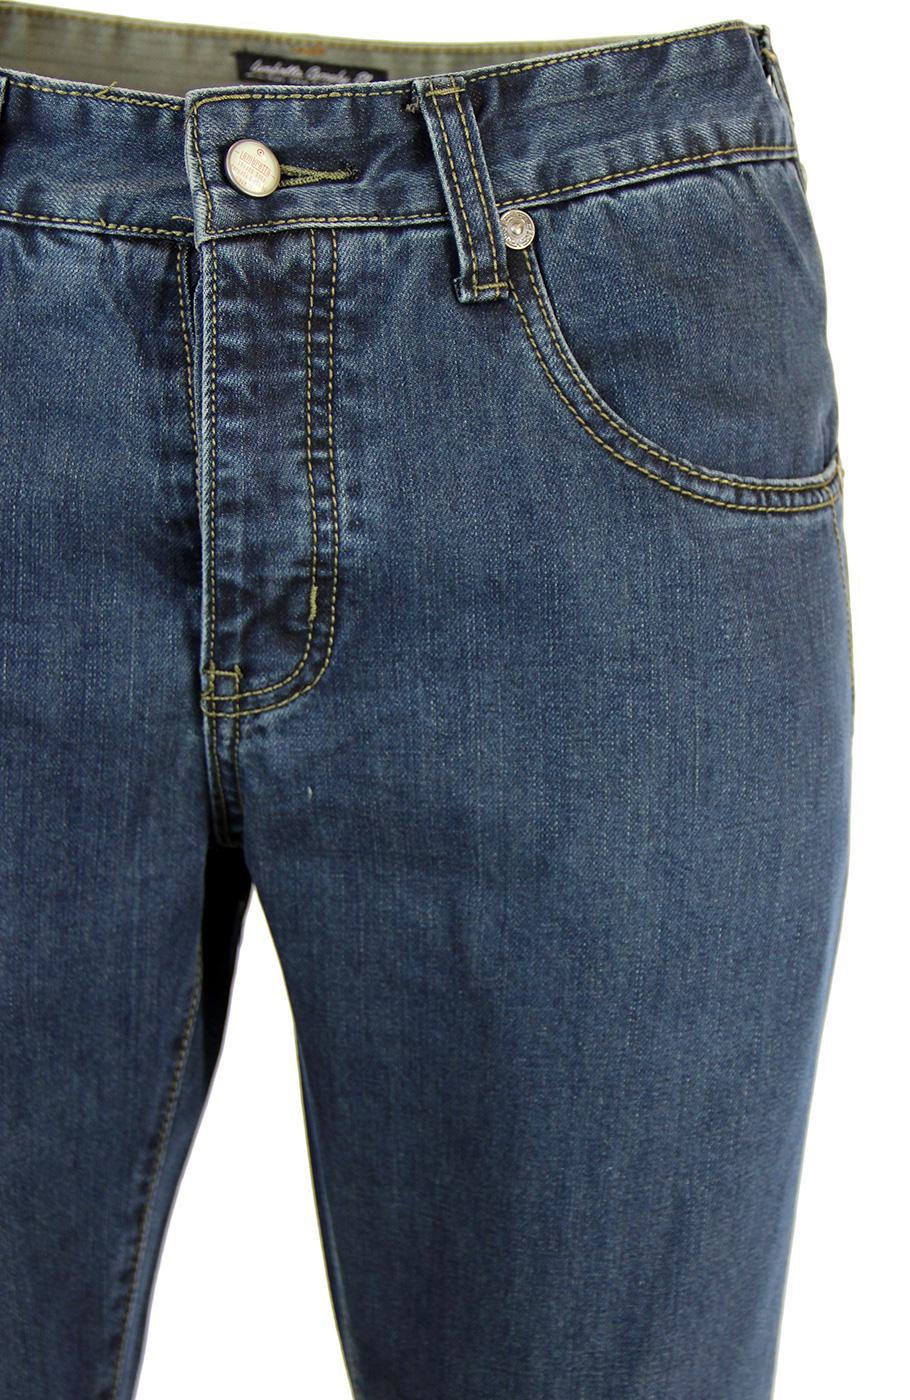 f7ffa578f2f LAMBRETTA Mens Retro Indie Target Pocket Jeans in Overdye